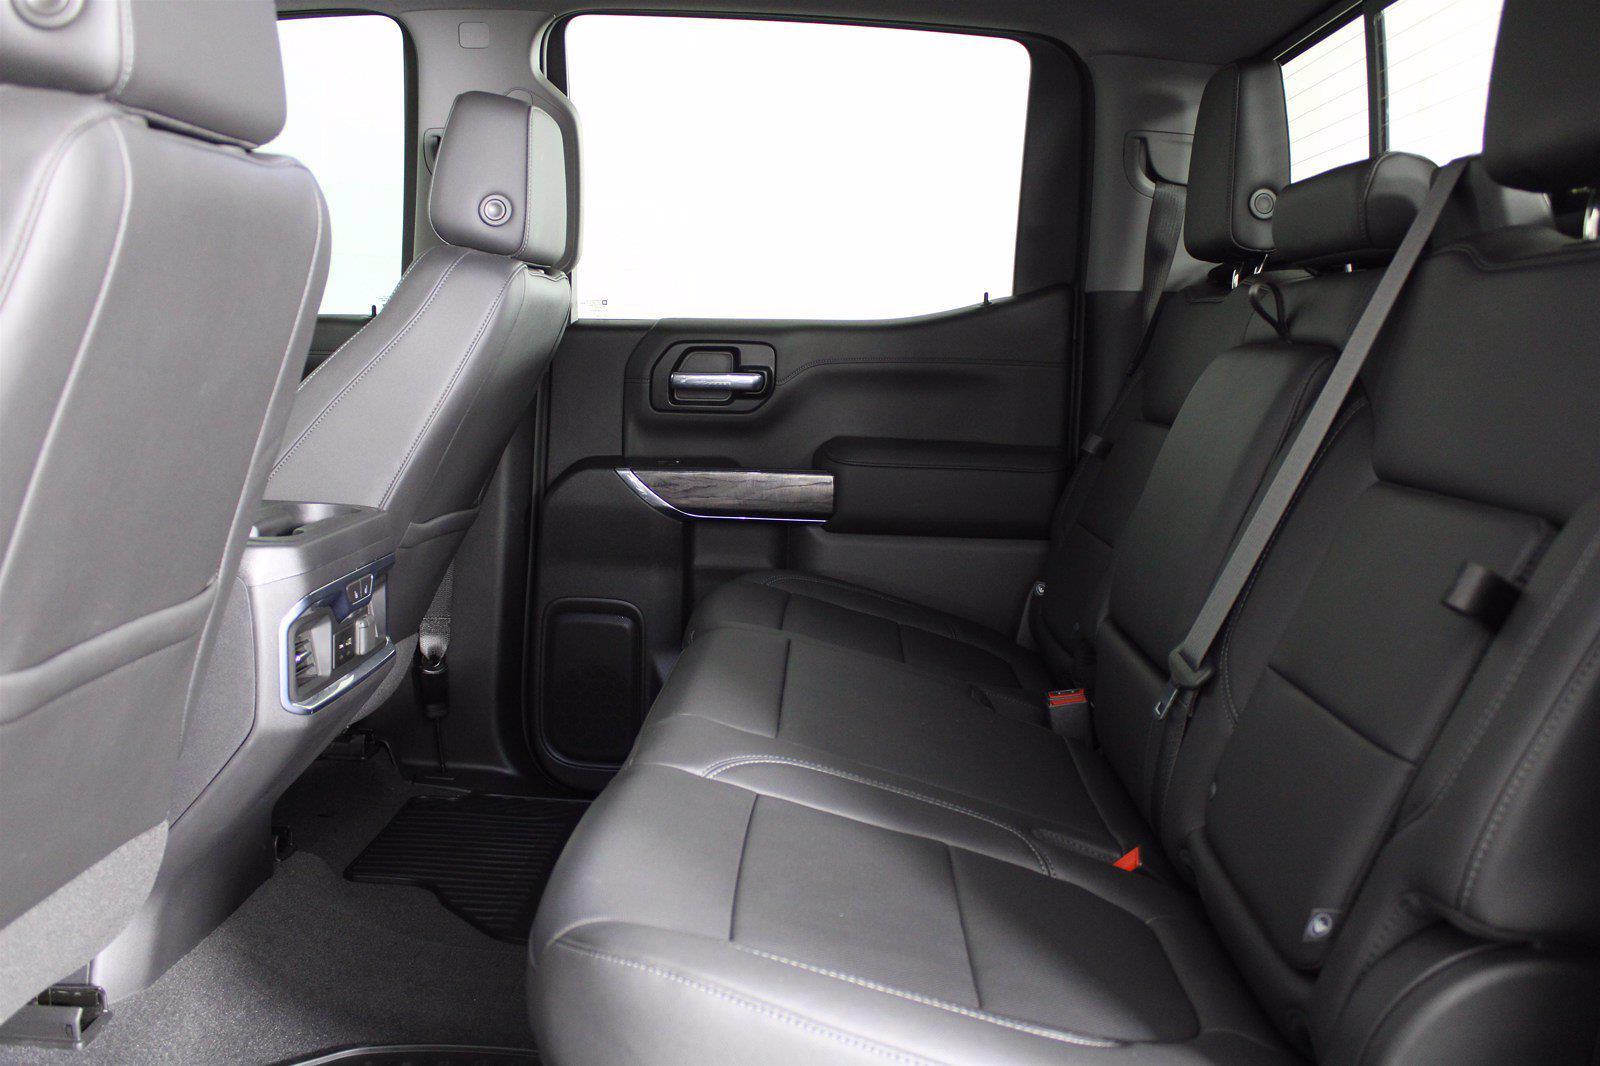 2020 Chevrolet Silverado 1500 Crew Cab 4x4, Pickup #D110641A - photo 8